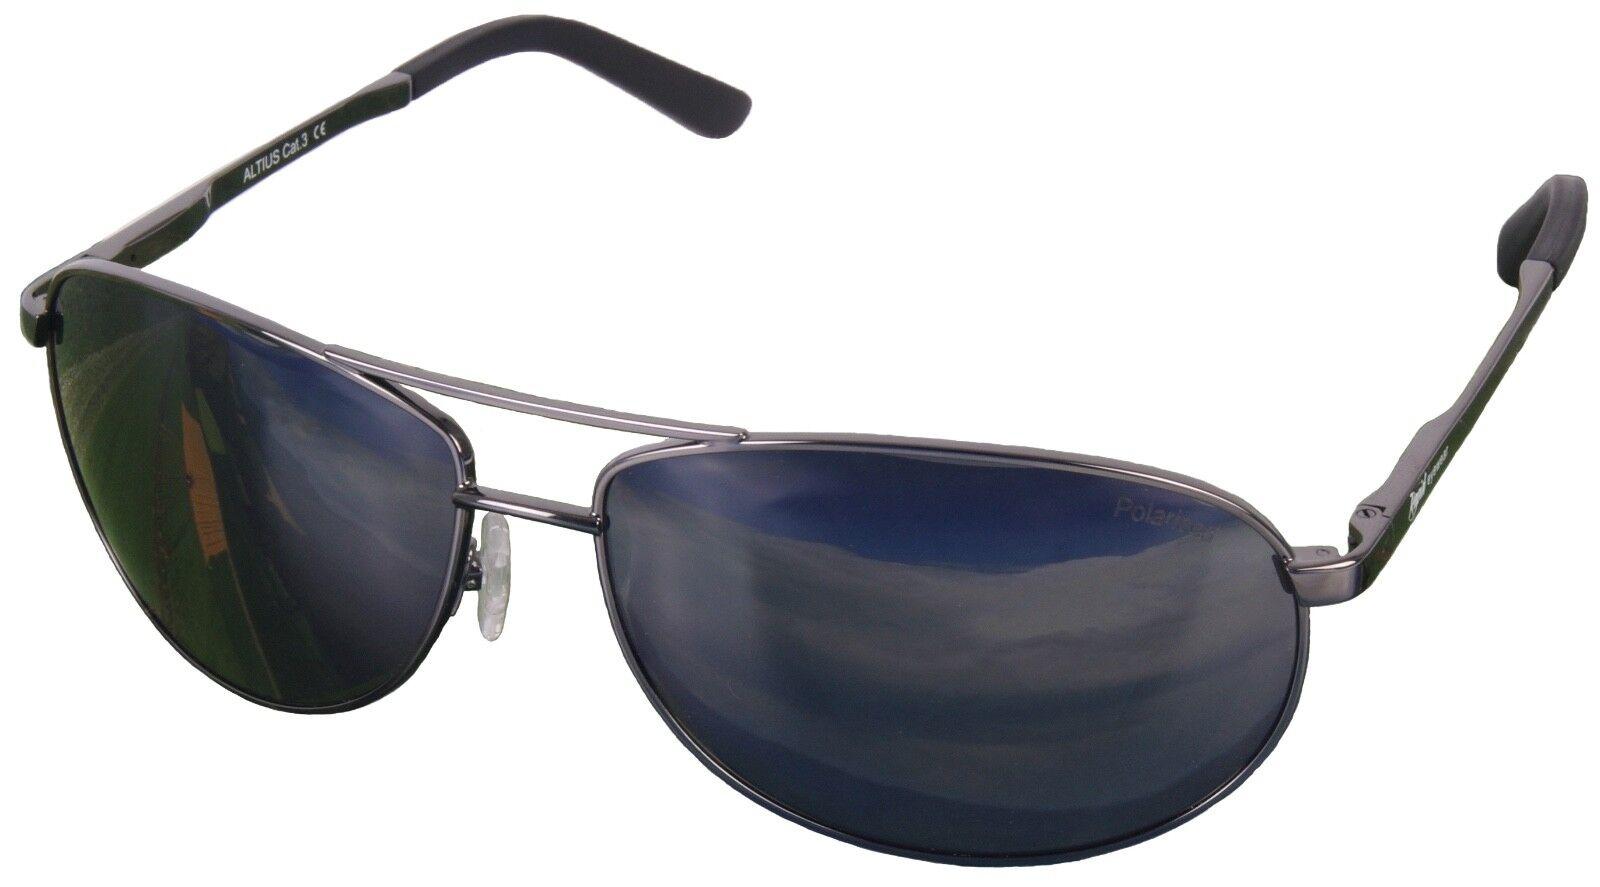 POLARIZED AVIATOR SUNGLASSES Mens Womens UV  Prescription Options. Rapid Eyewear